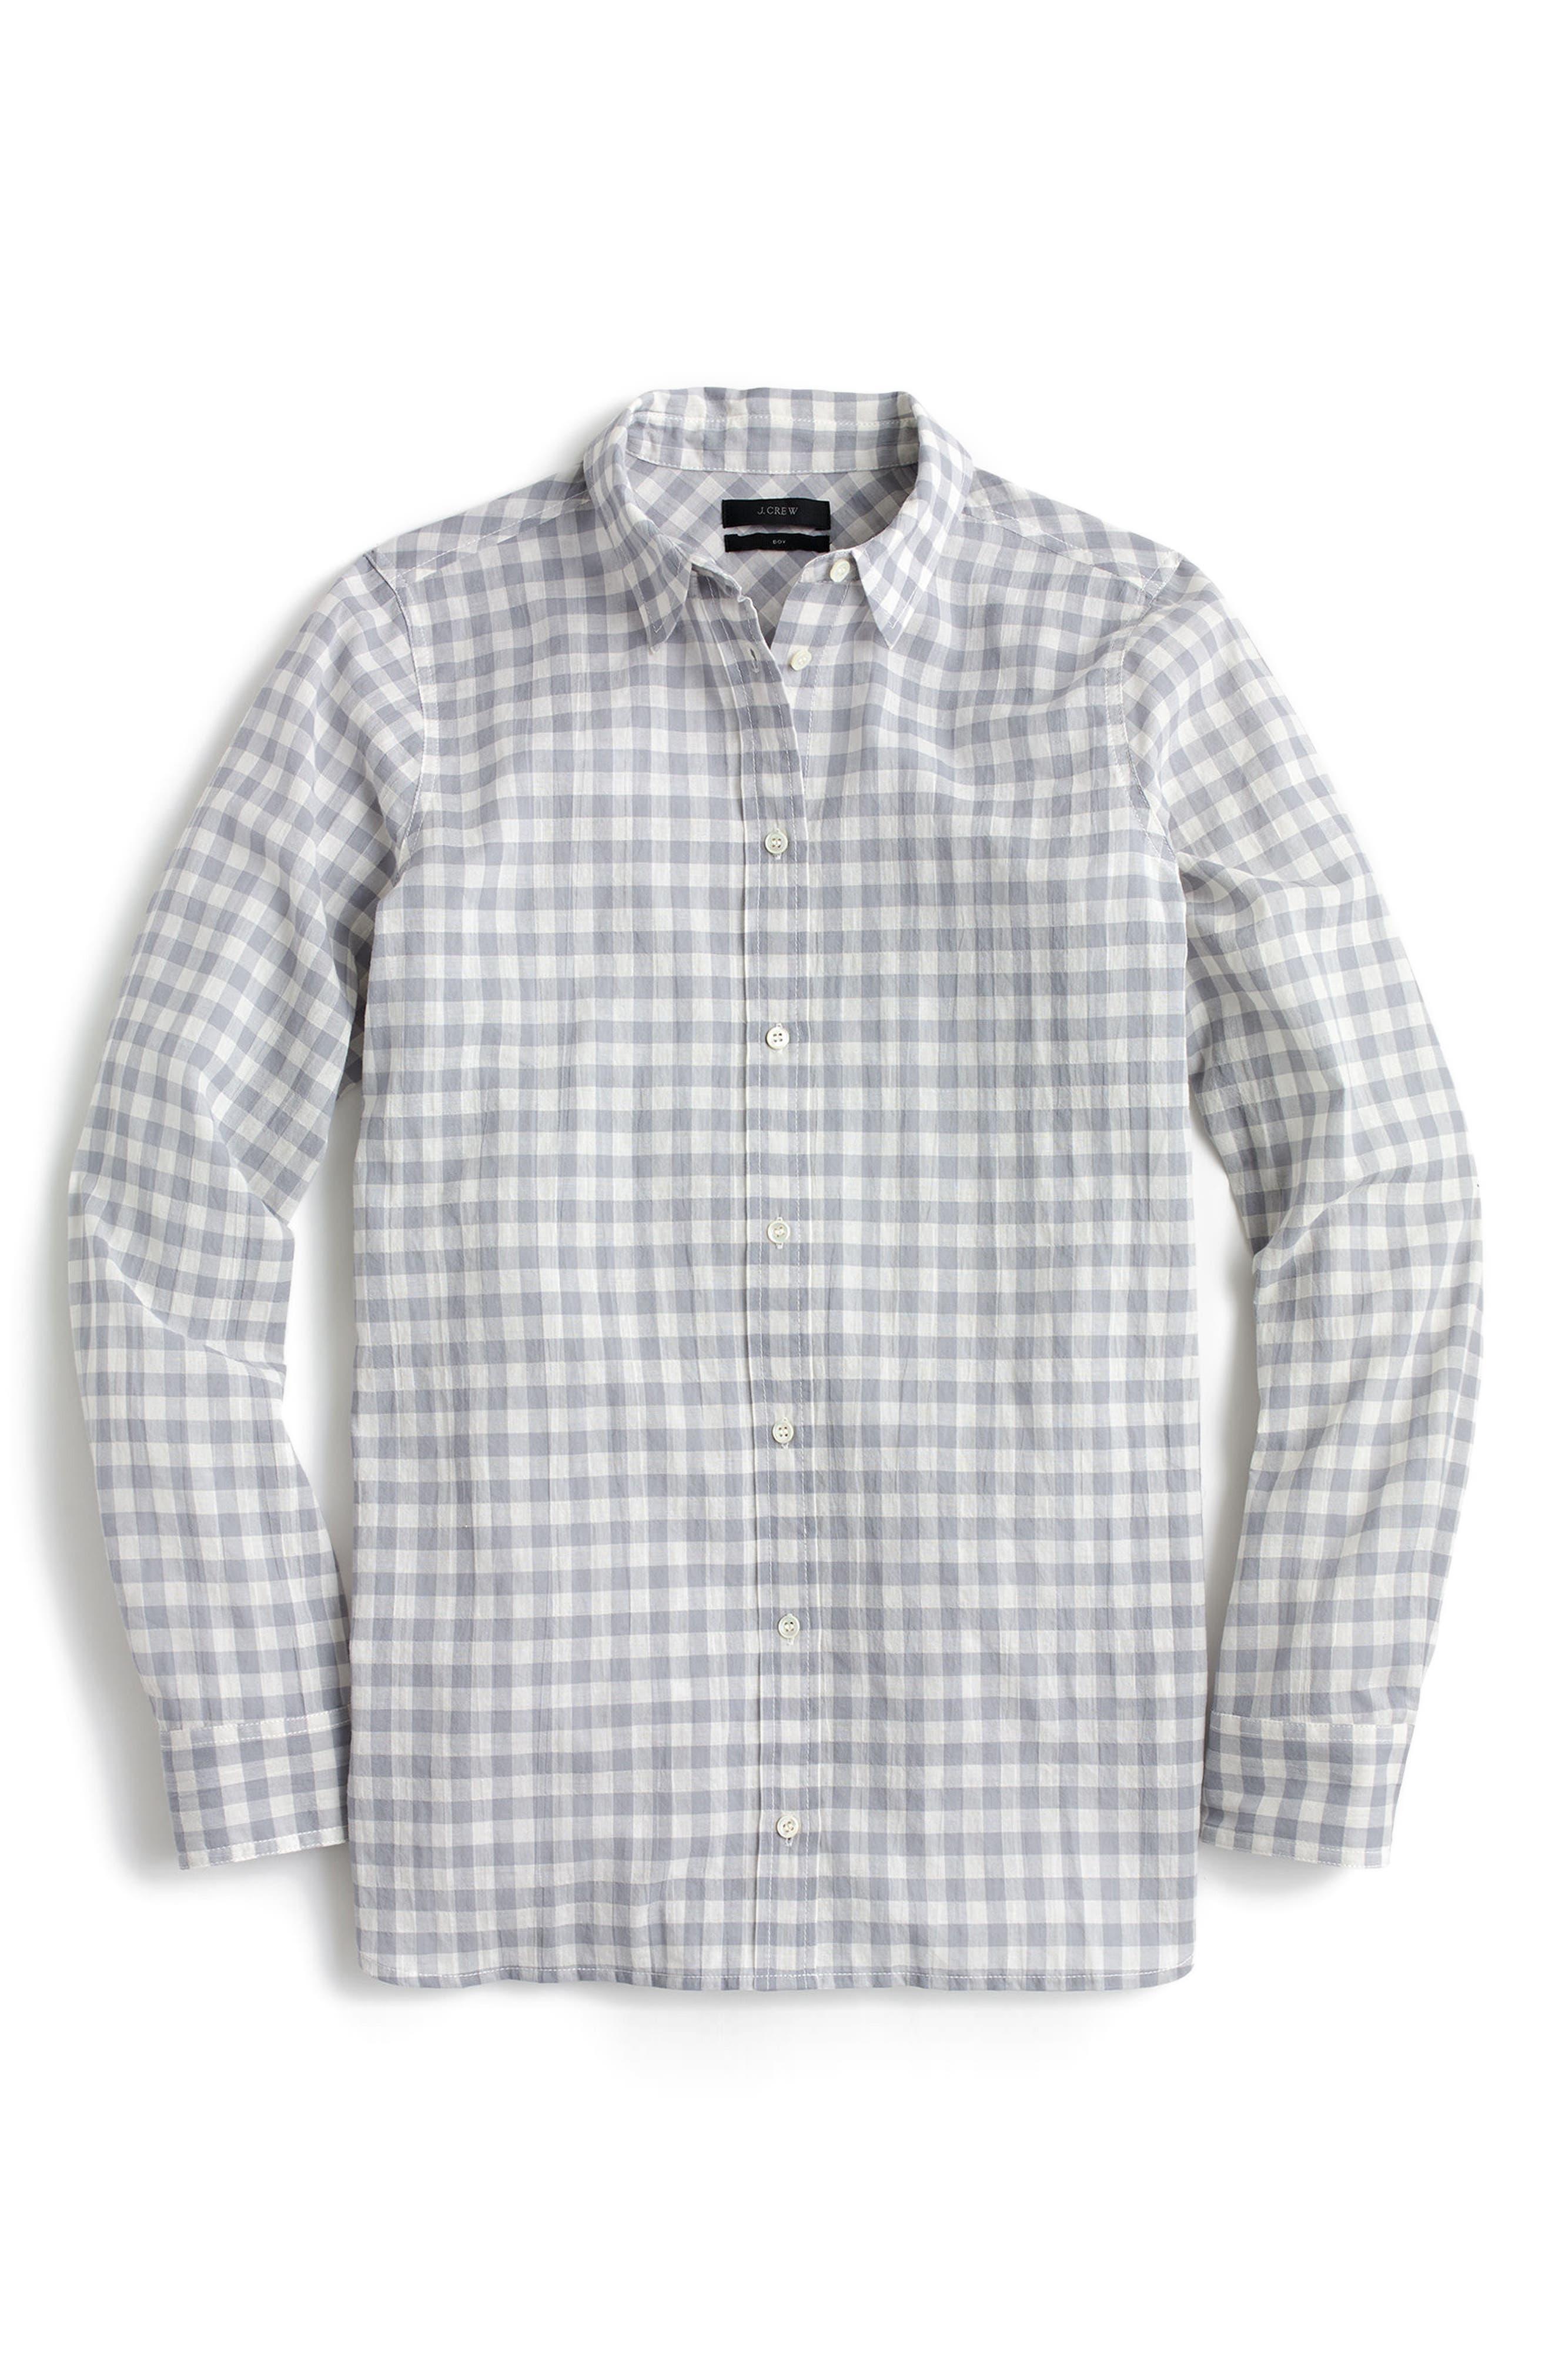 J.CREW Crinkle Gingham Boy Shirt, Main, color, 020